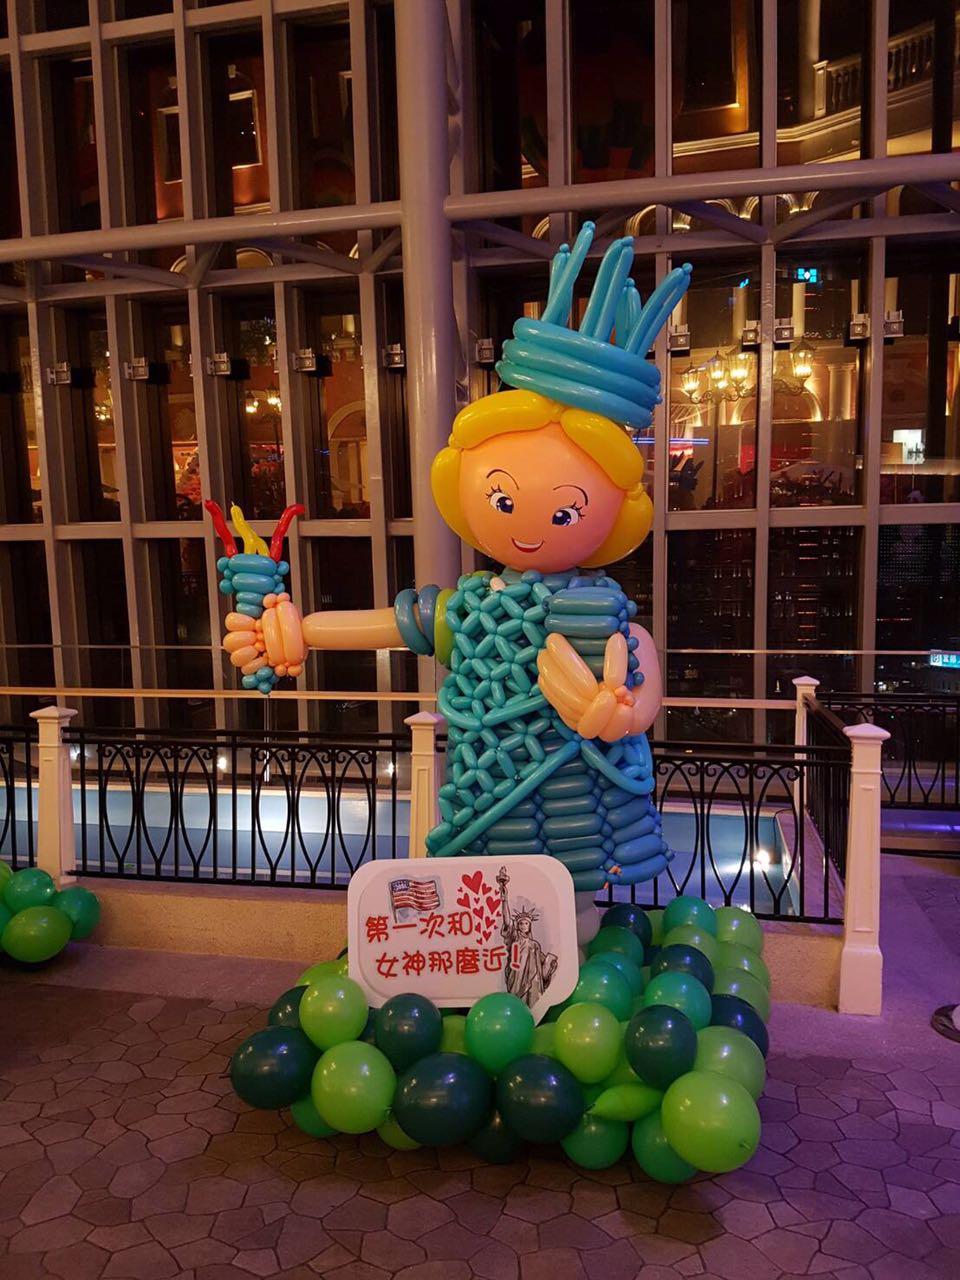 Around the World Theme Balloon Exhibit Statue of Liberty USA